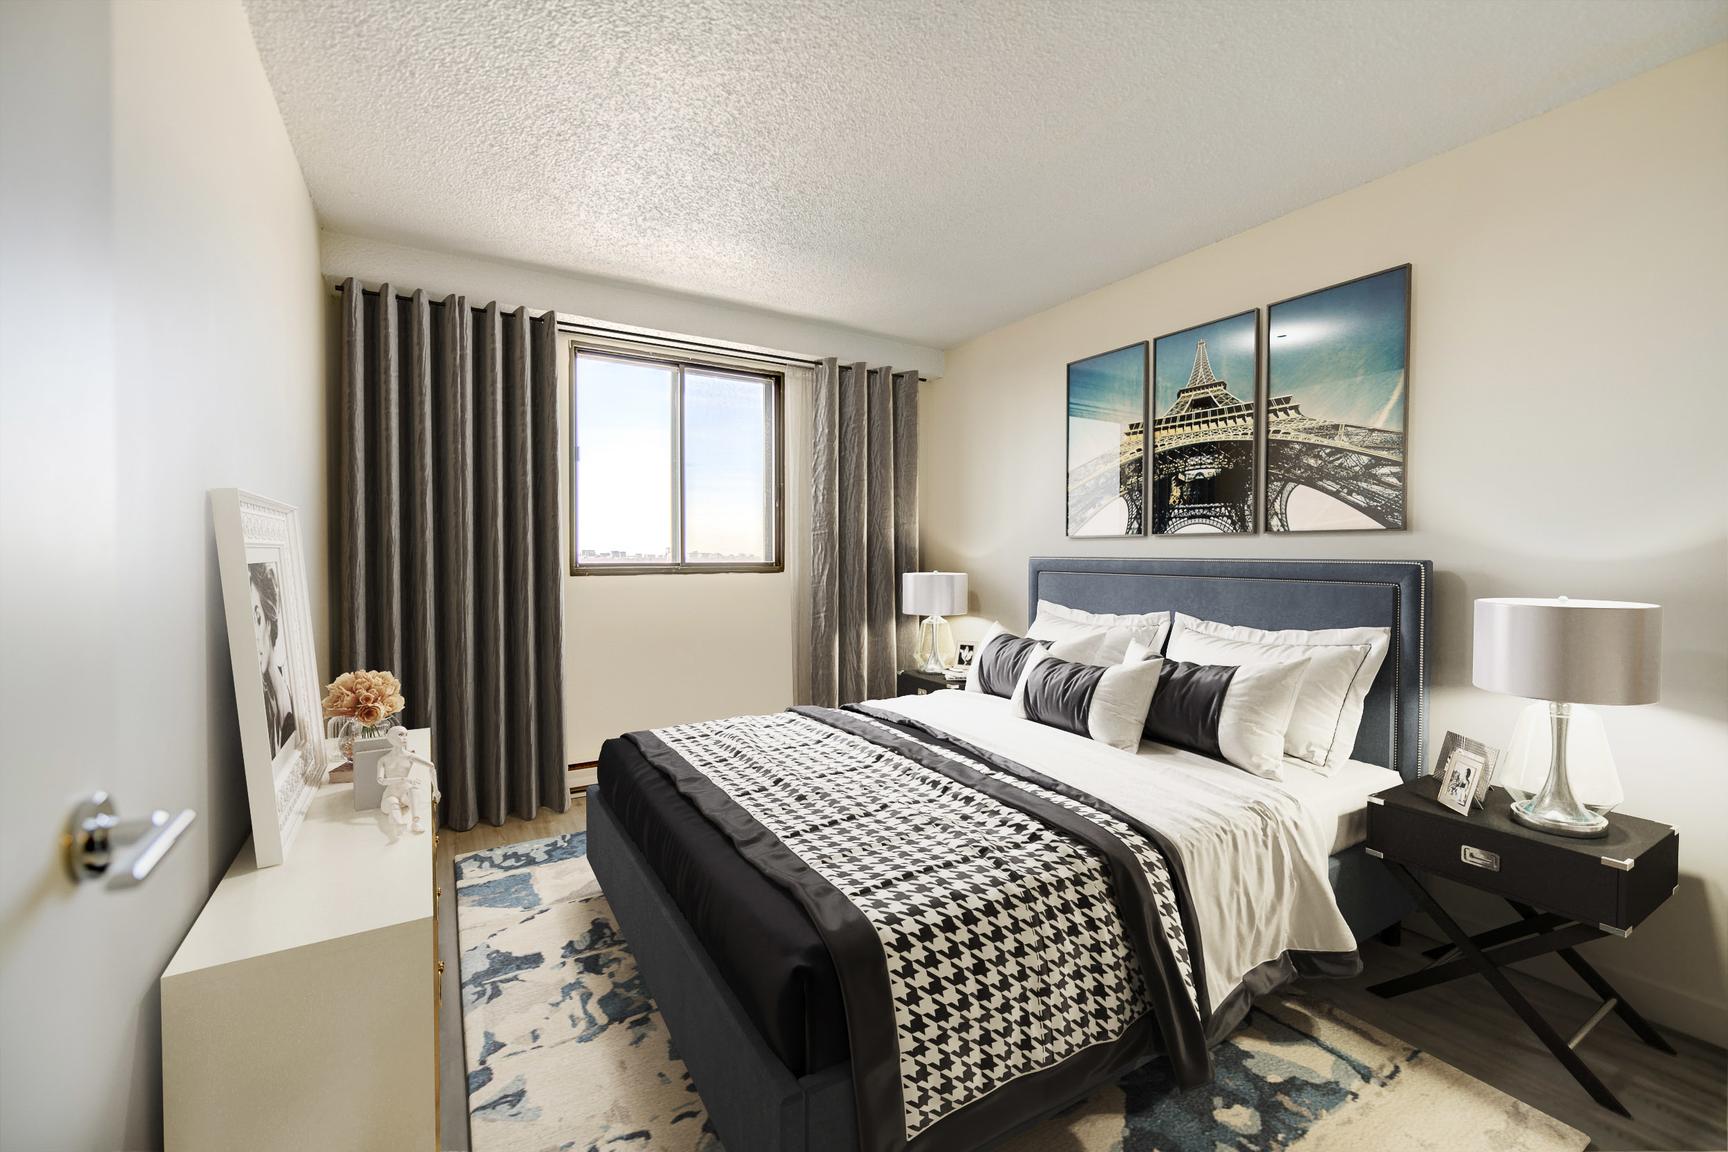 1 bedroom Apartments for rent in Laval at Le Quatre Cent - Photo 04 - RentQuebecApartments – L407183